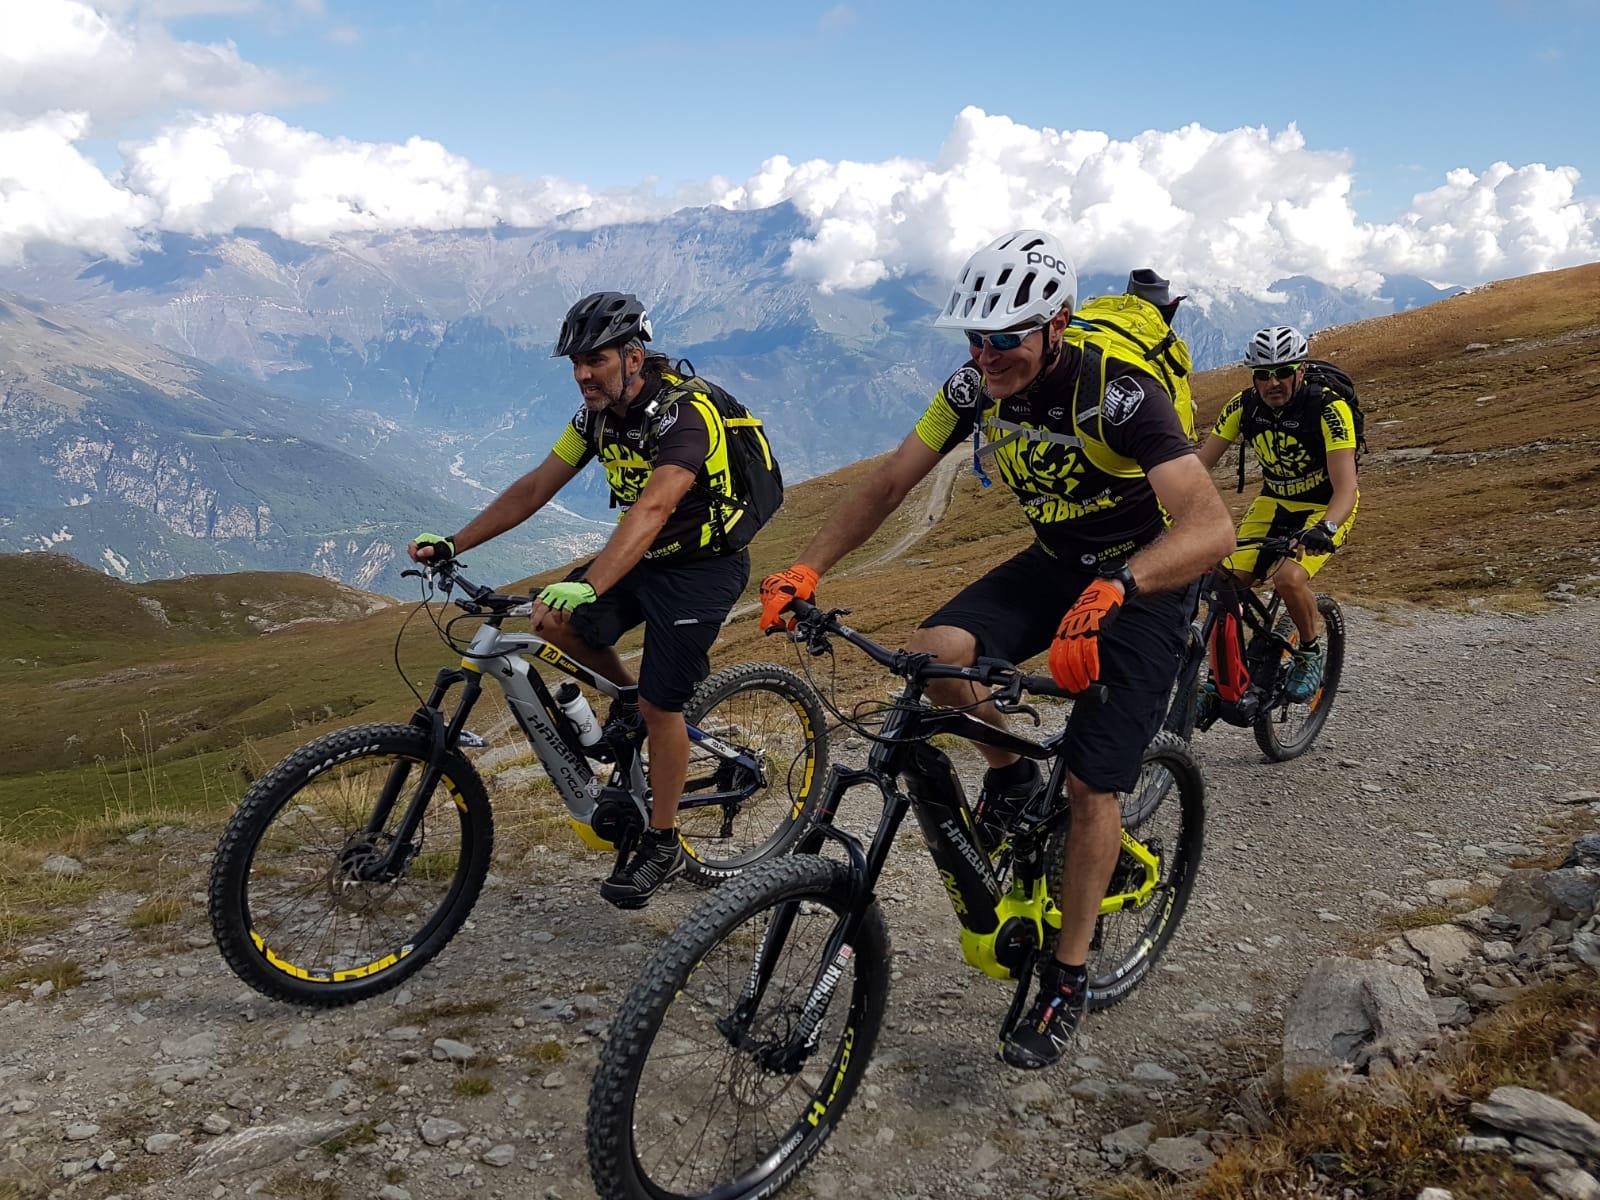 Estate 2019 - proposte di itinerari in bicicletta in Val Susa 1